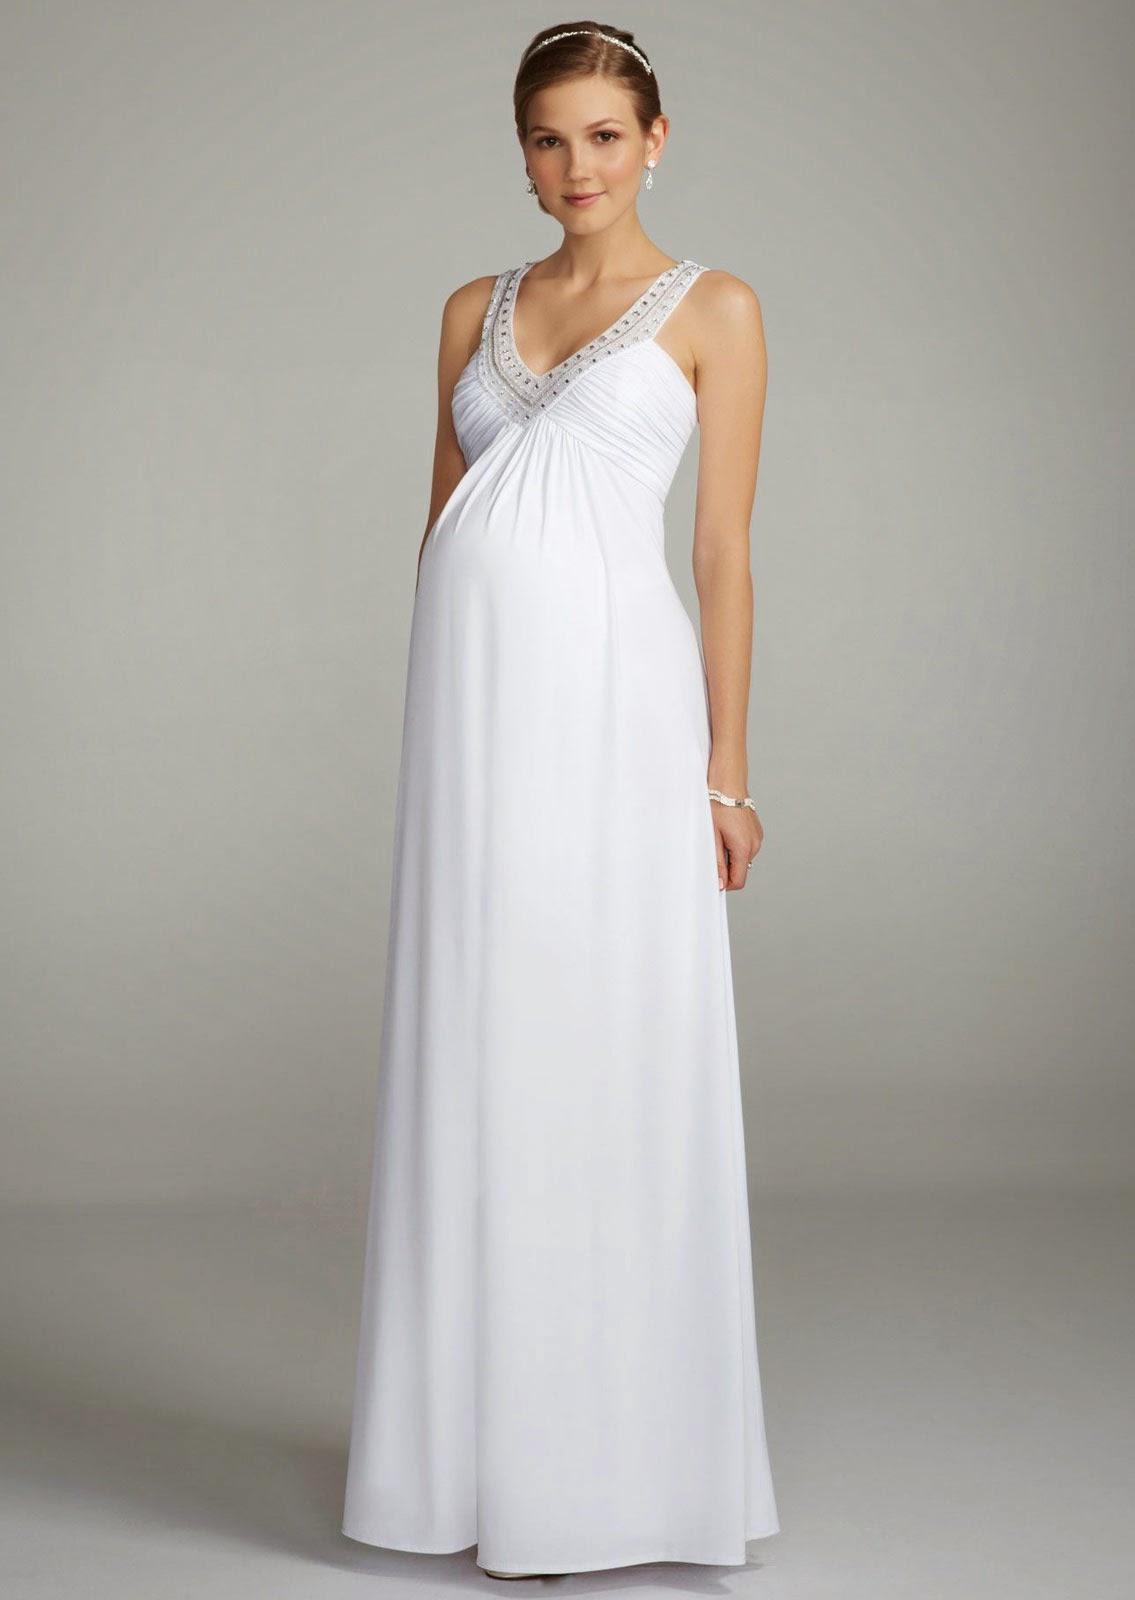 maternity wedding dresses cheap photo - 1